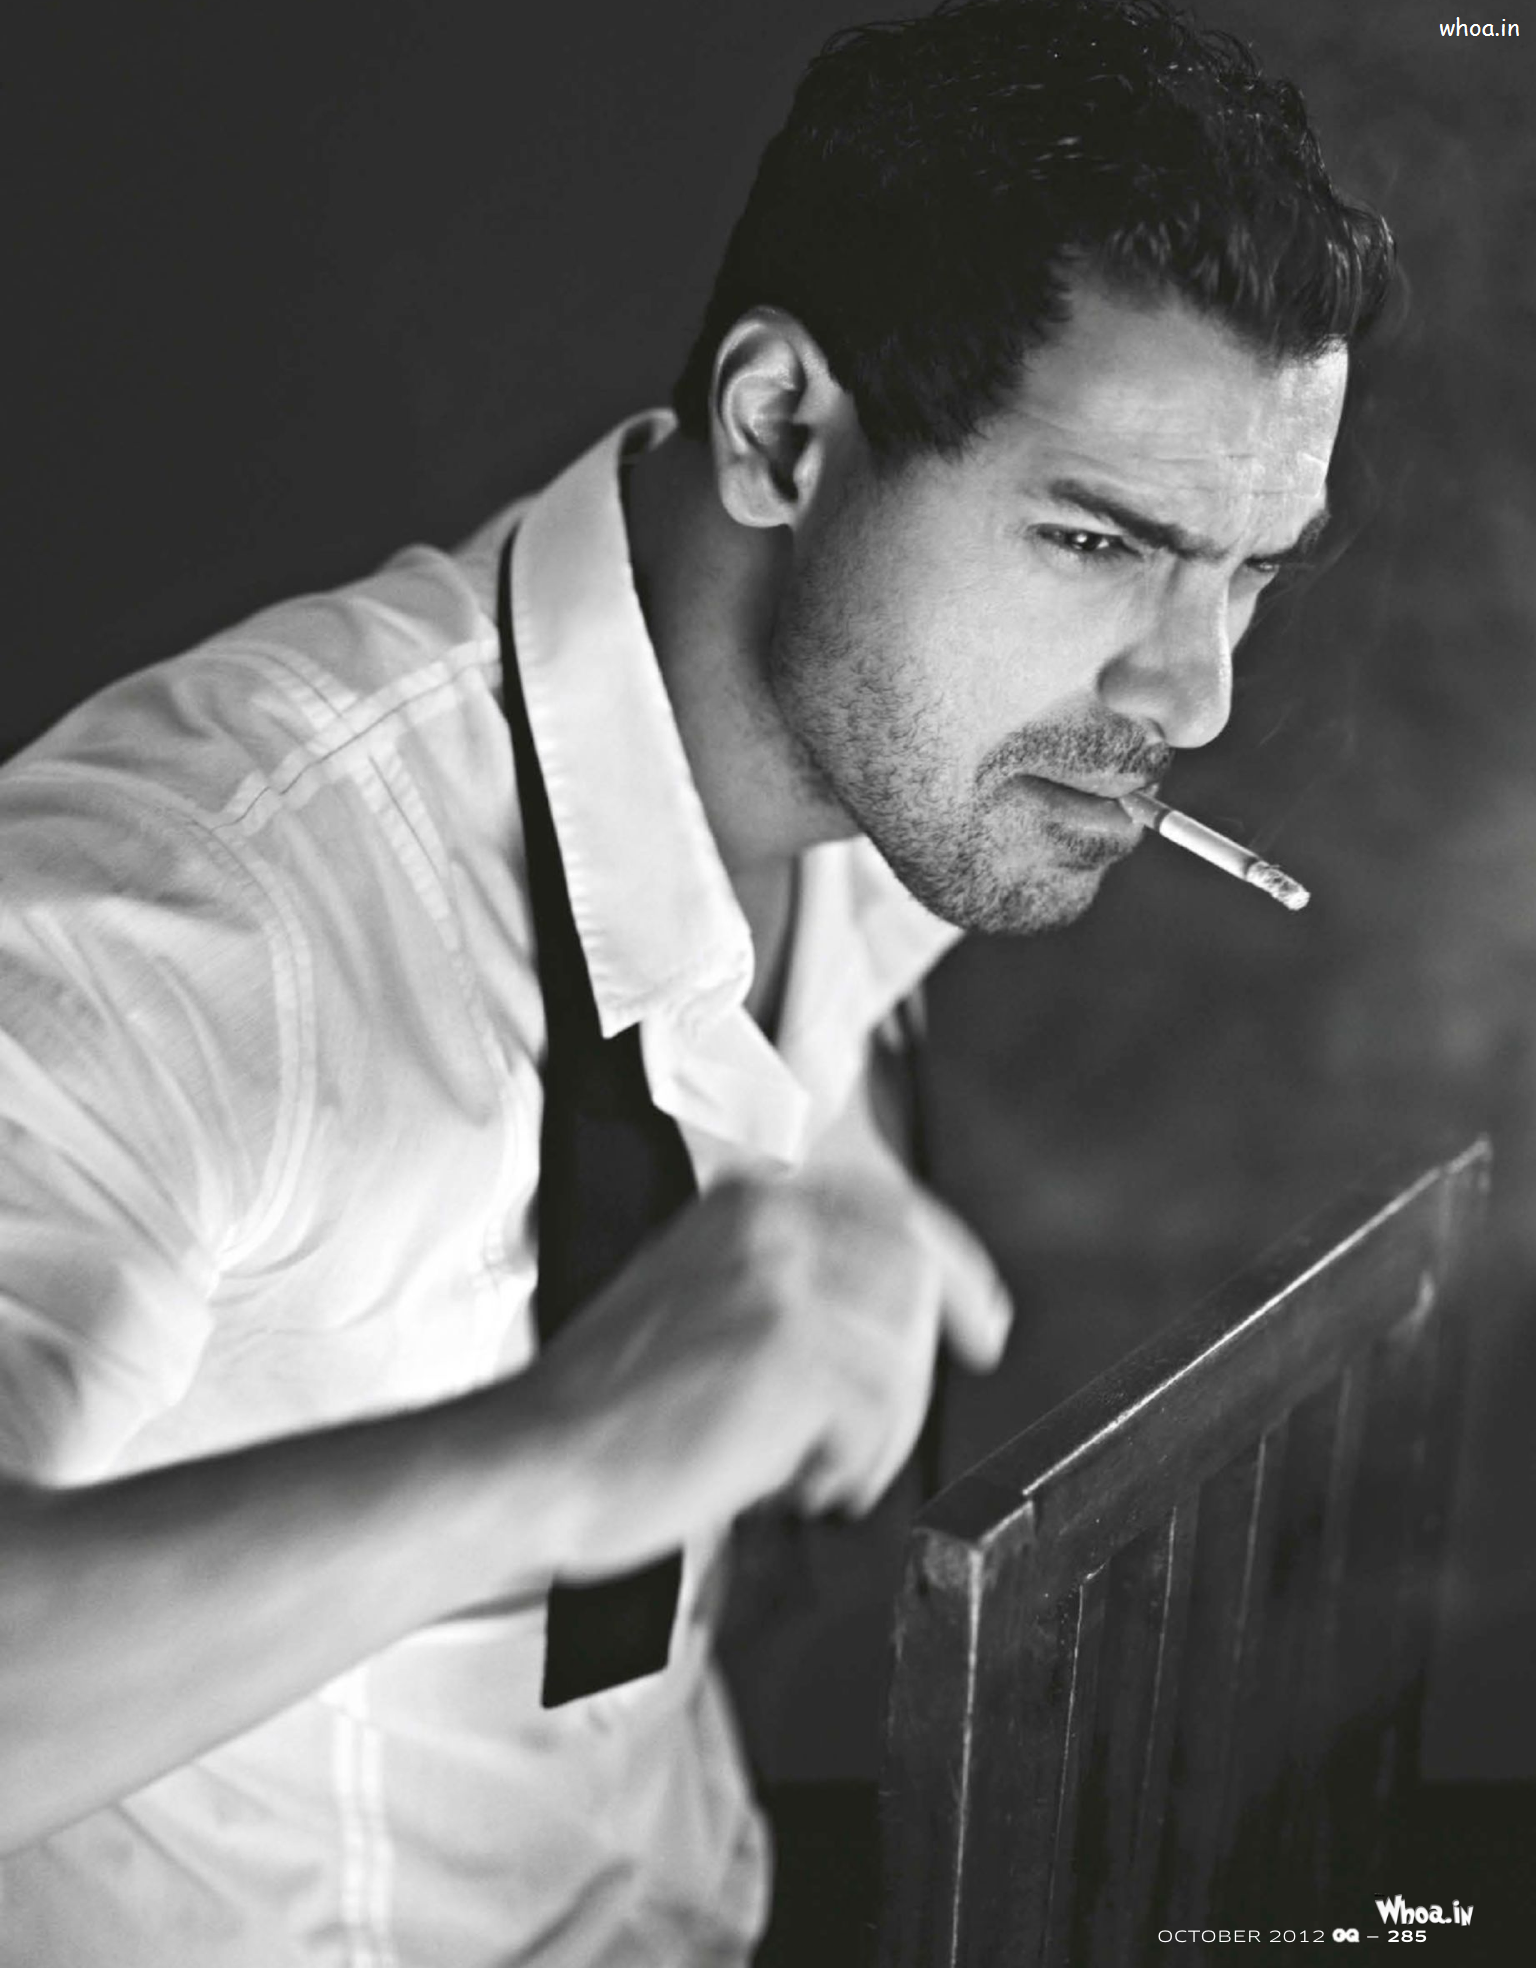 John abraham smoking with black and white image